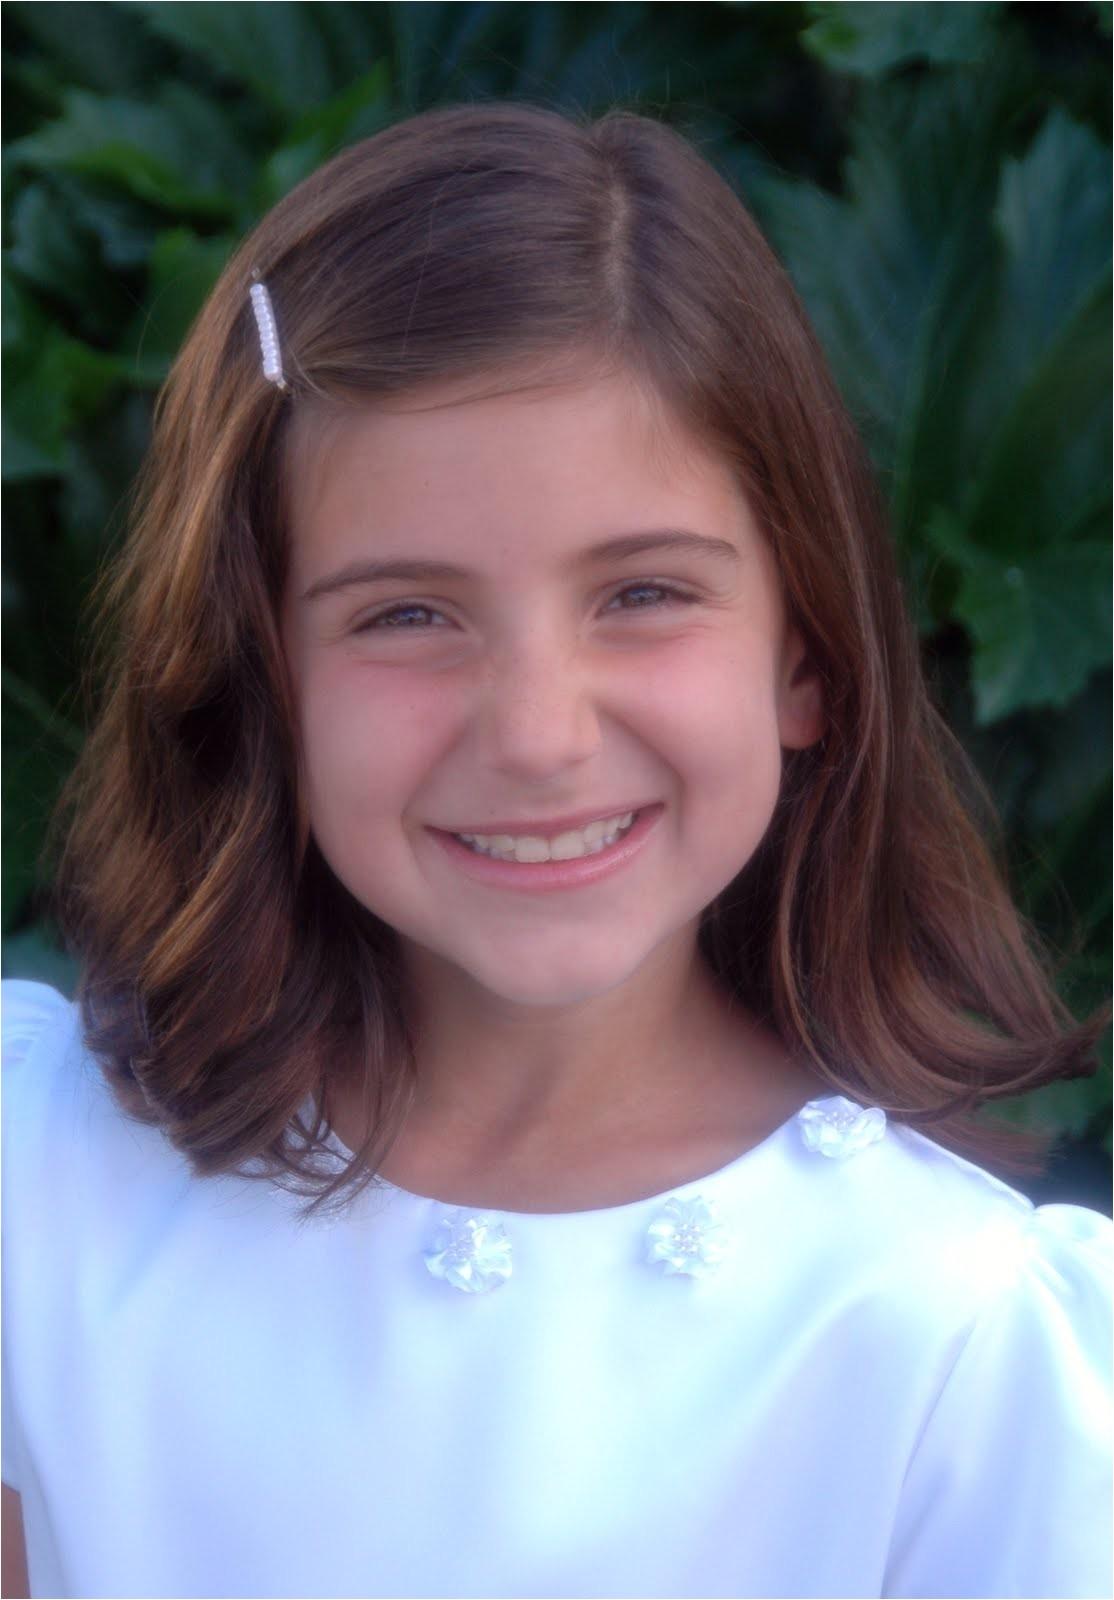 8 year old girl haircuts